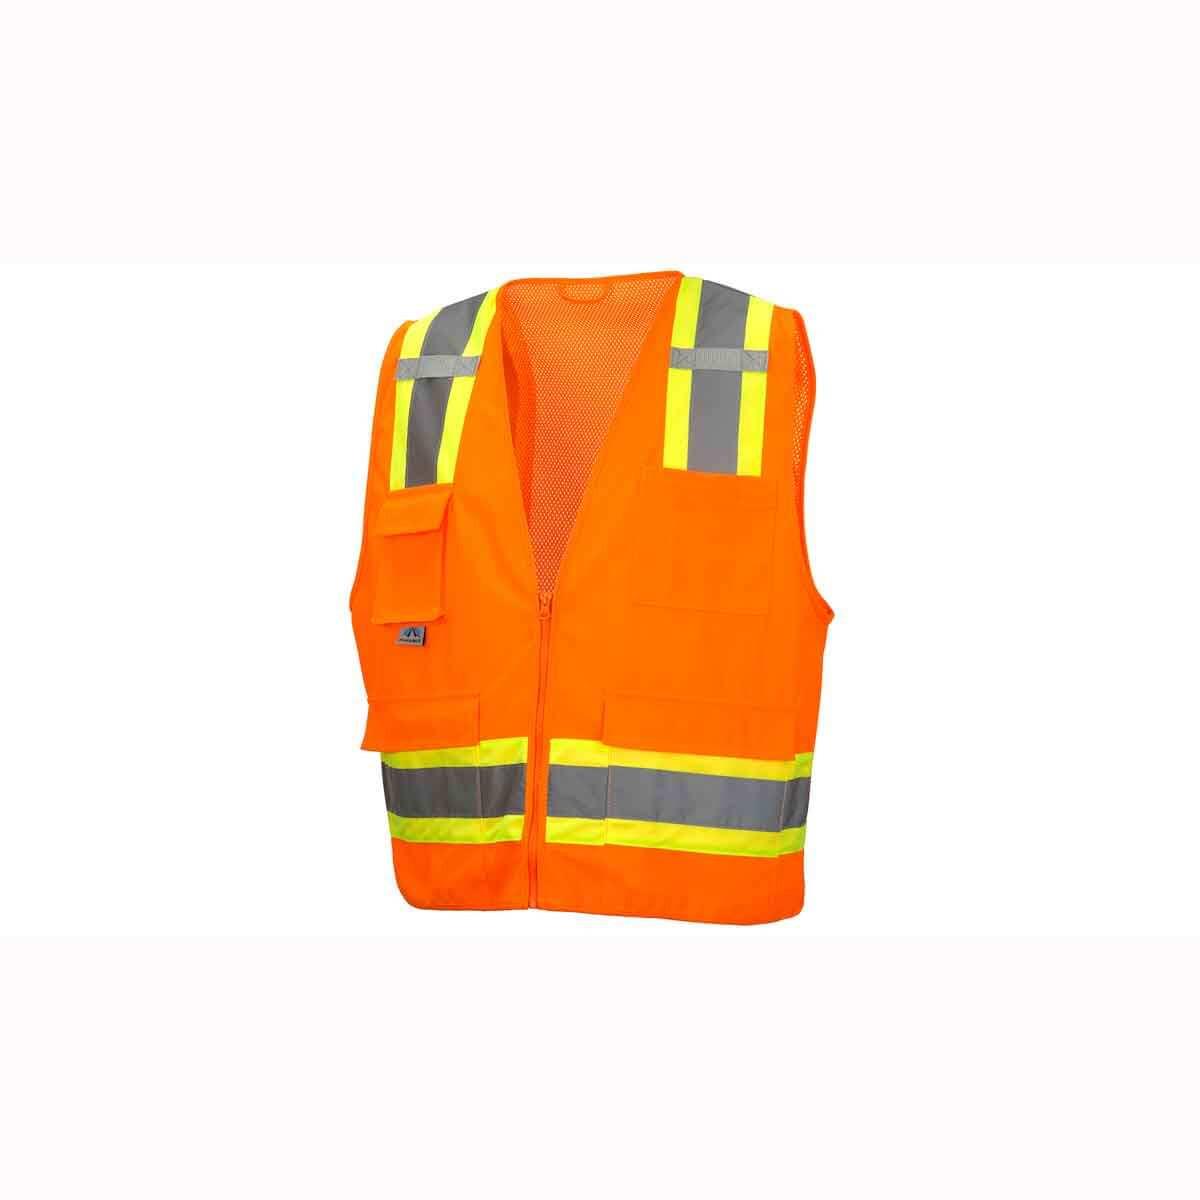 Neon Orange Construction Site Safety Vests